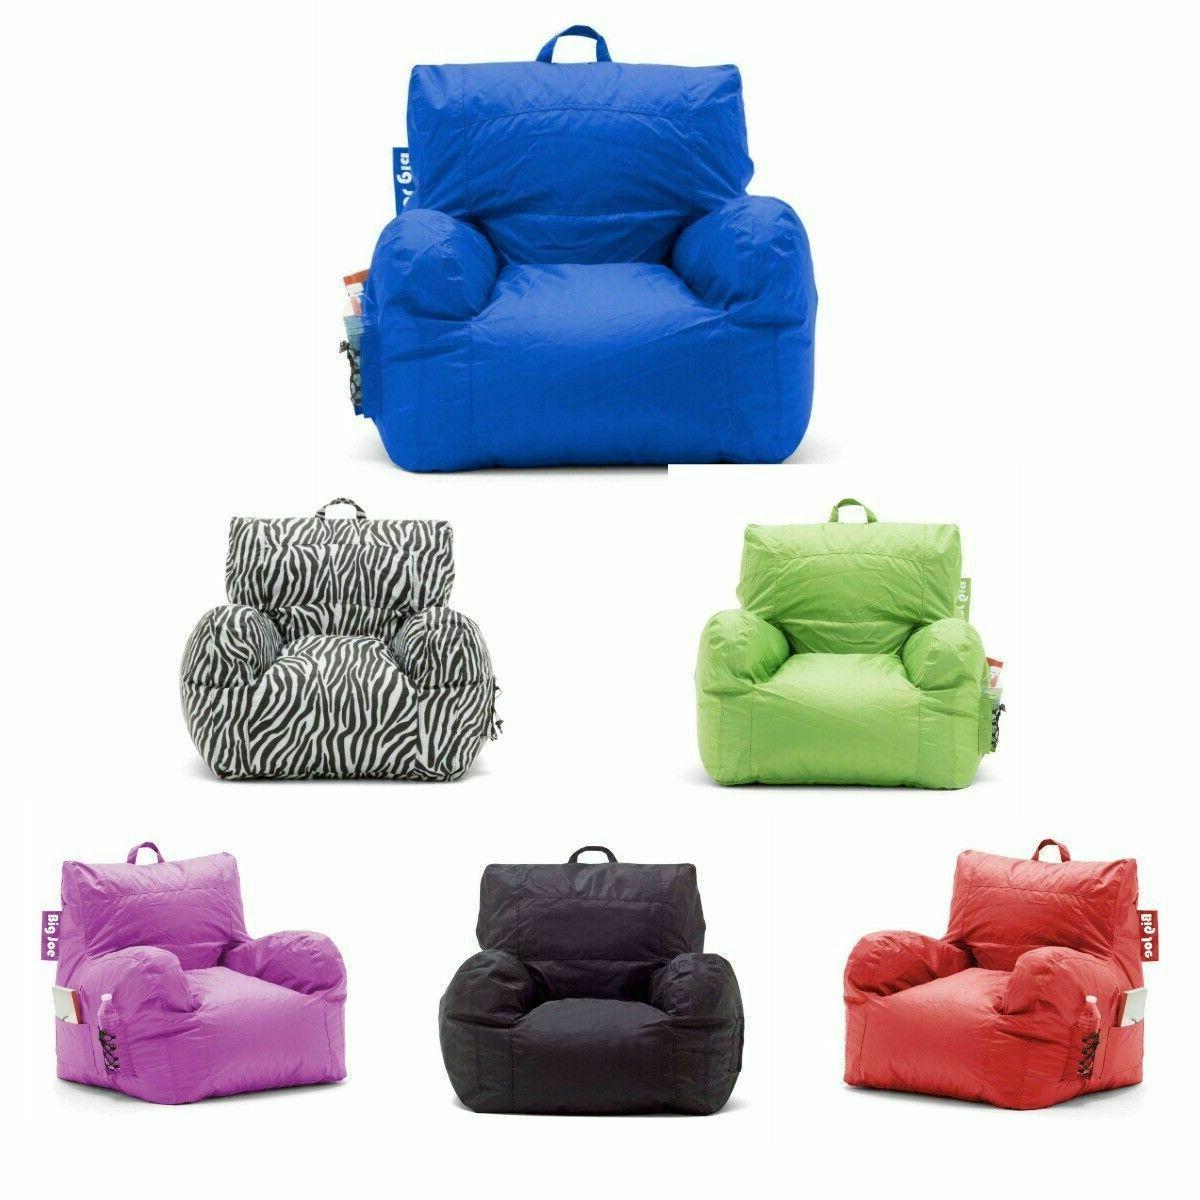 bean bag chair comfort dorm stain resistant